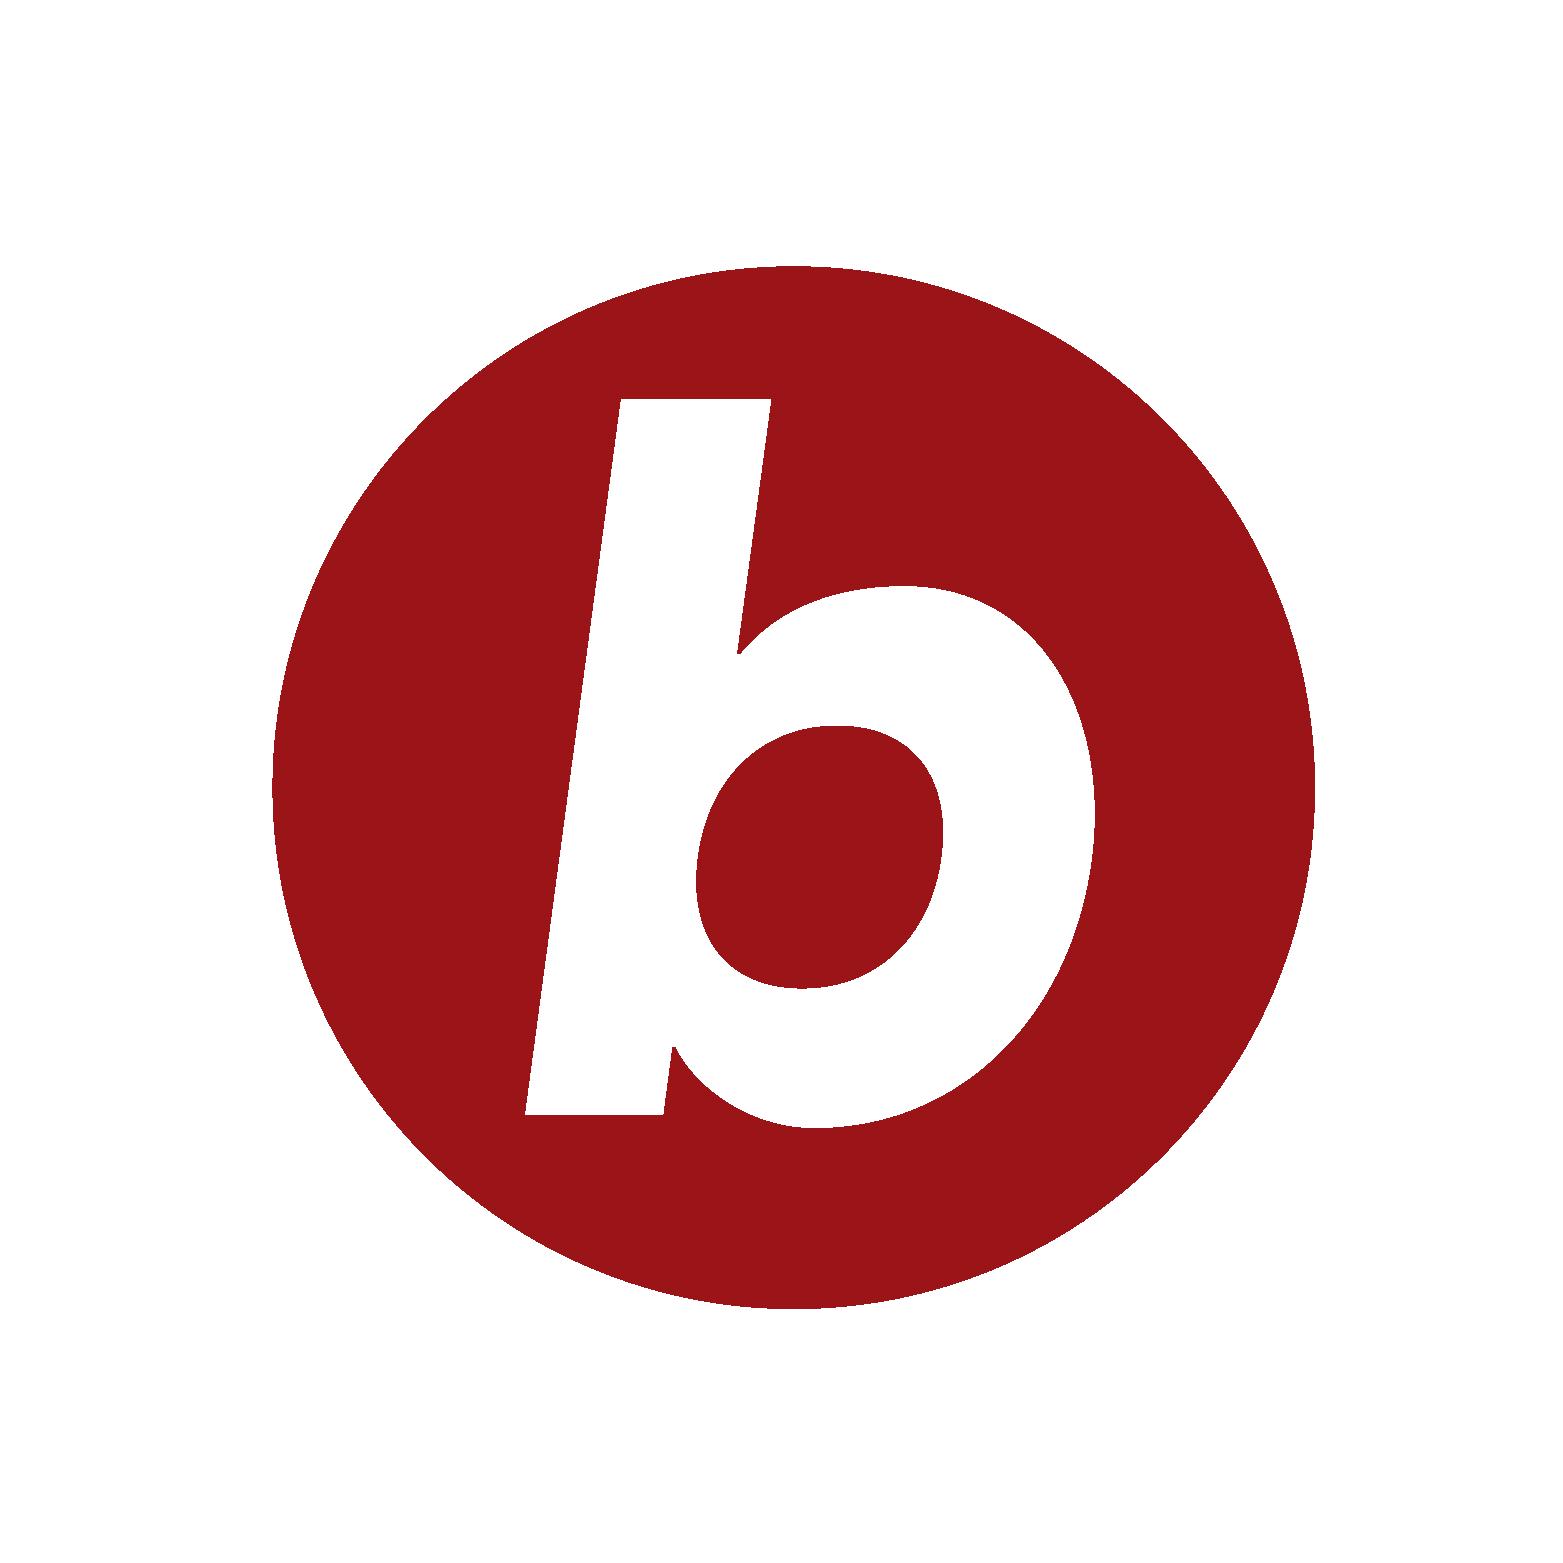 File:Boston.com red circular logo.png.